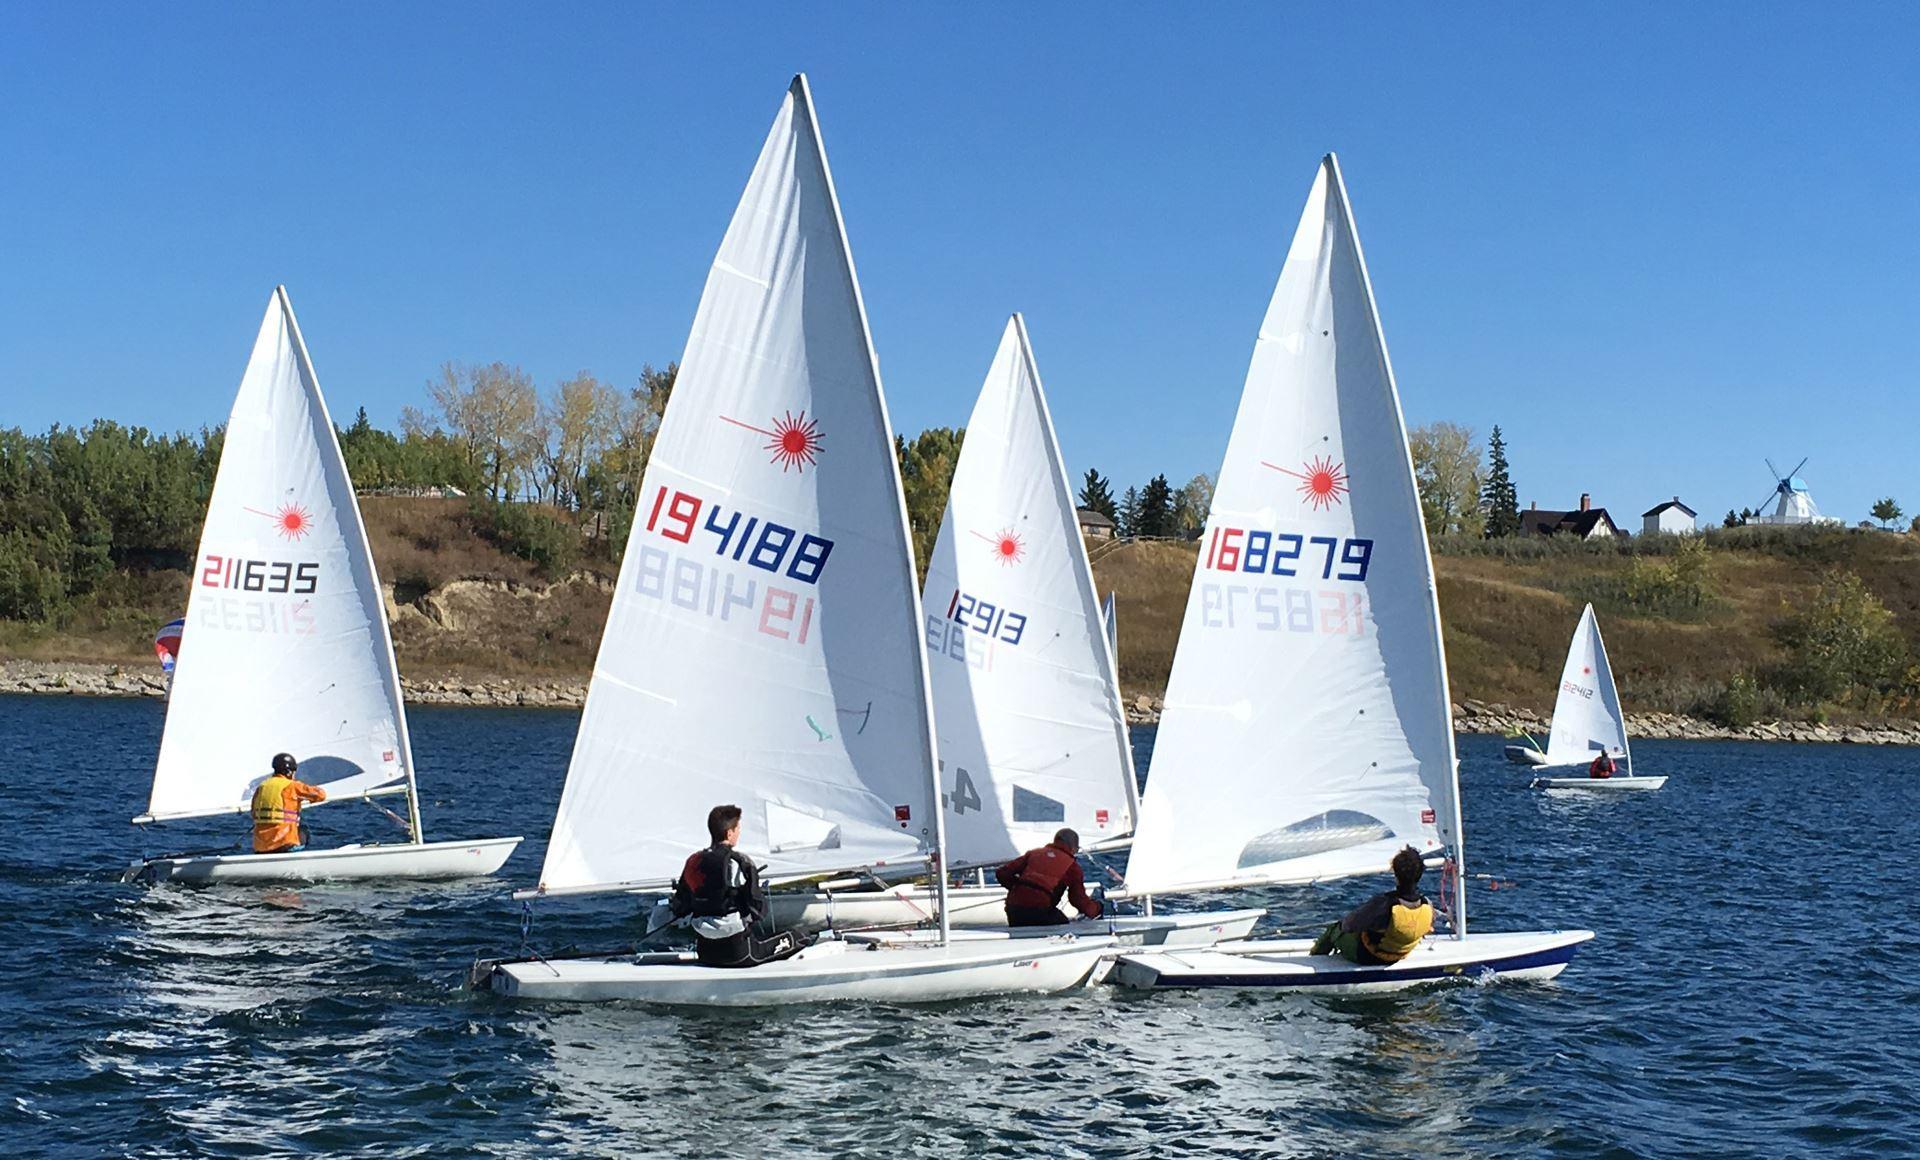 Glenmore Sailing Club - Sail Our Boats